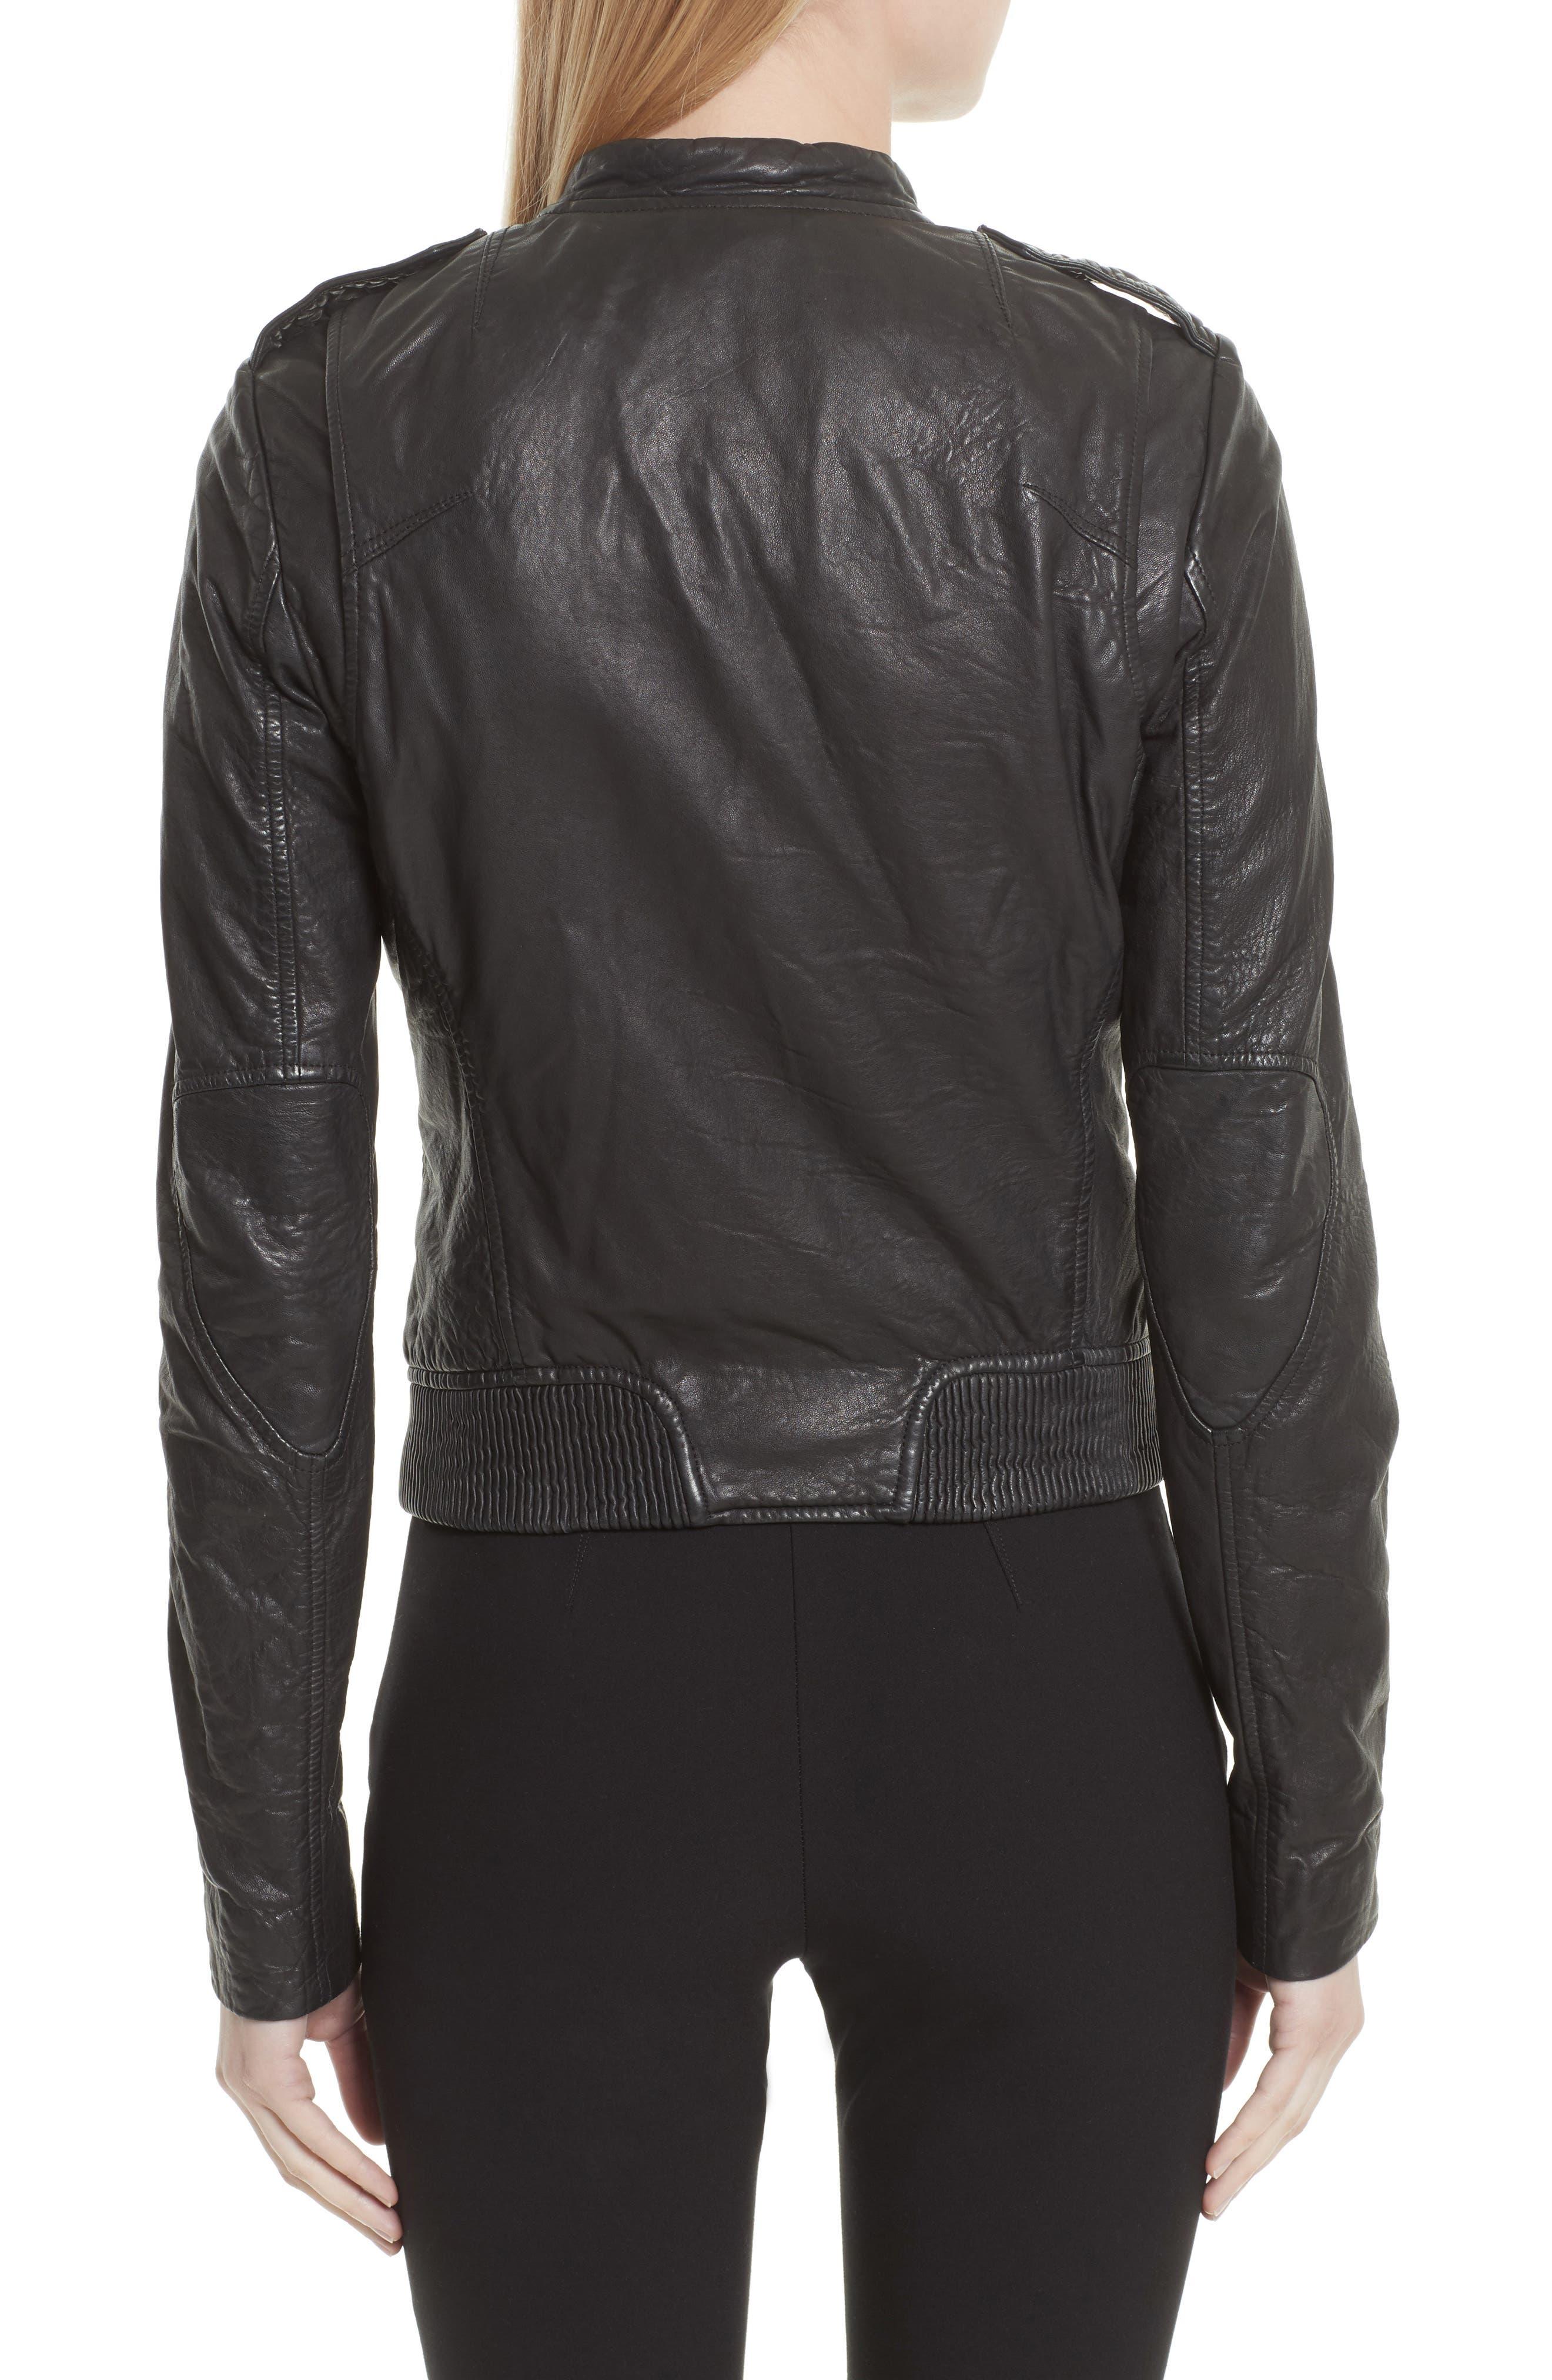 Lyon Leather Jacket,                             Alternate thumbnail 2, color,                             Black